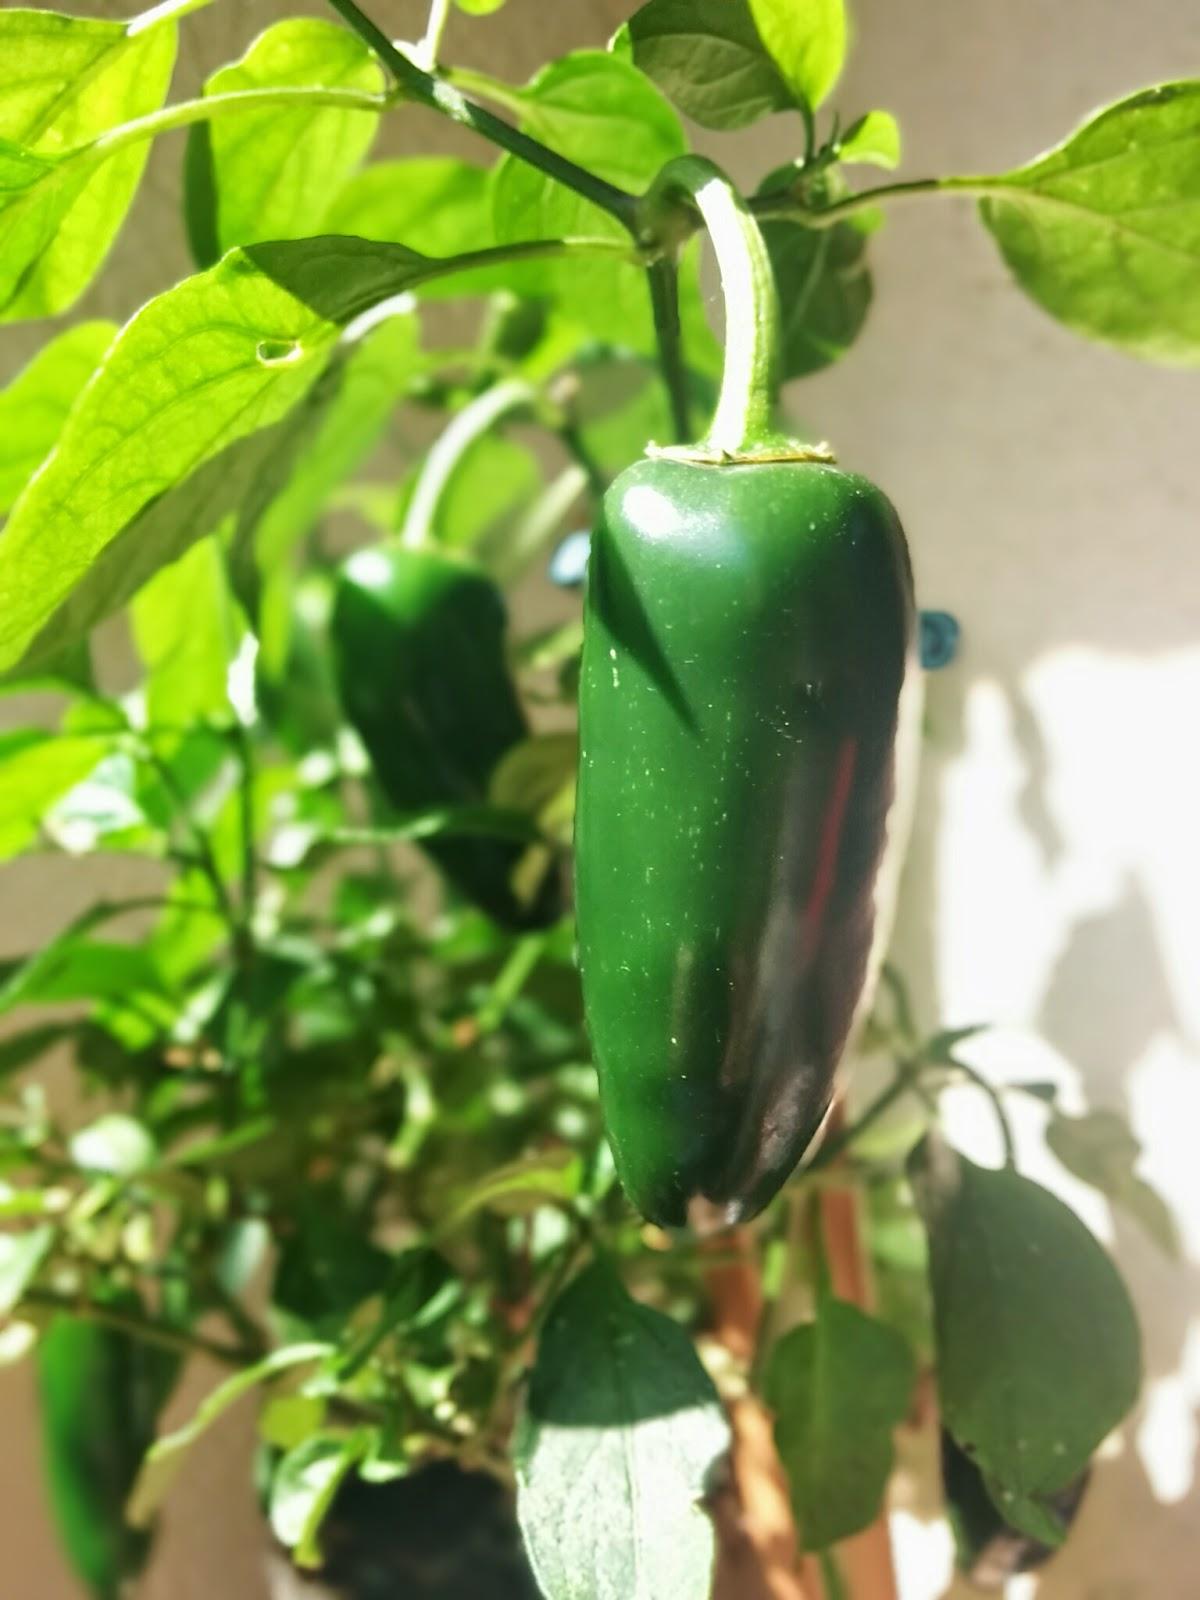 jalapeno chili